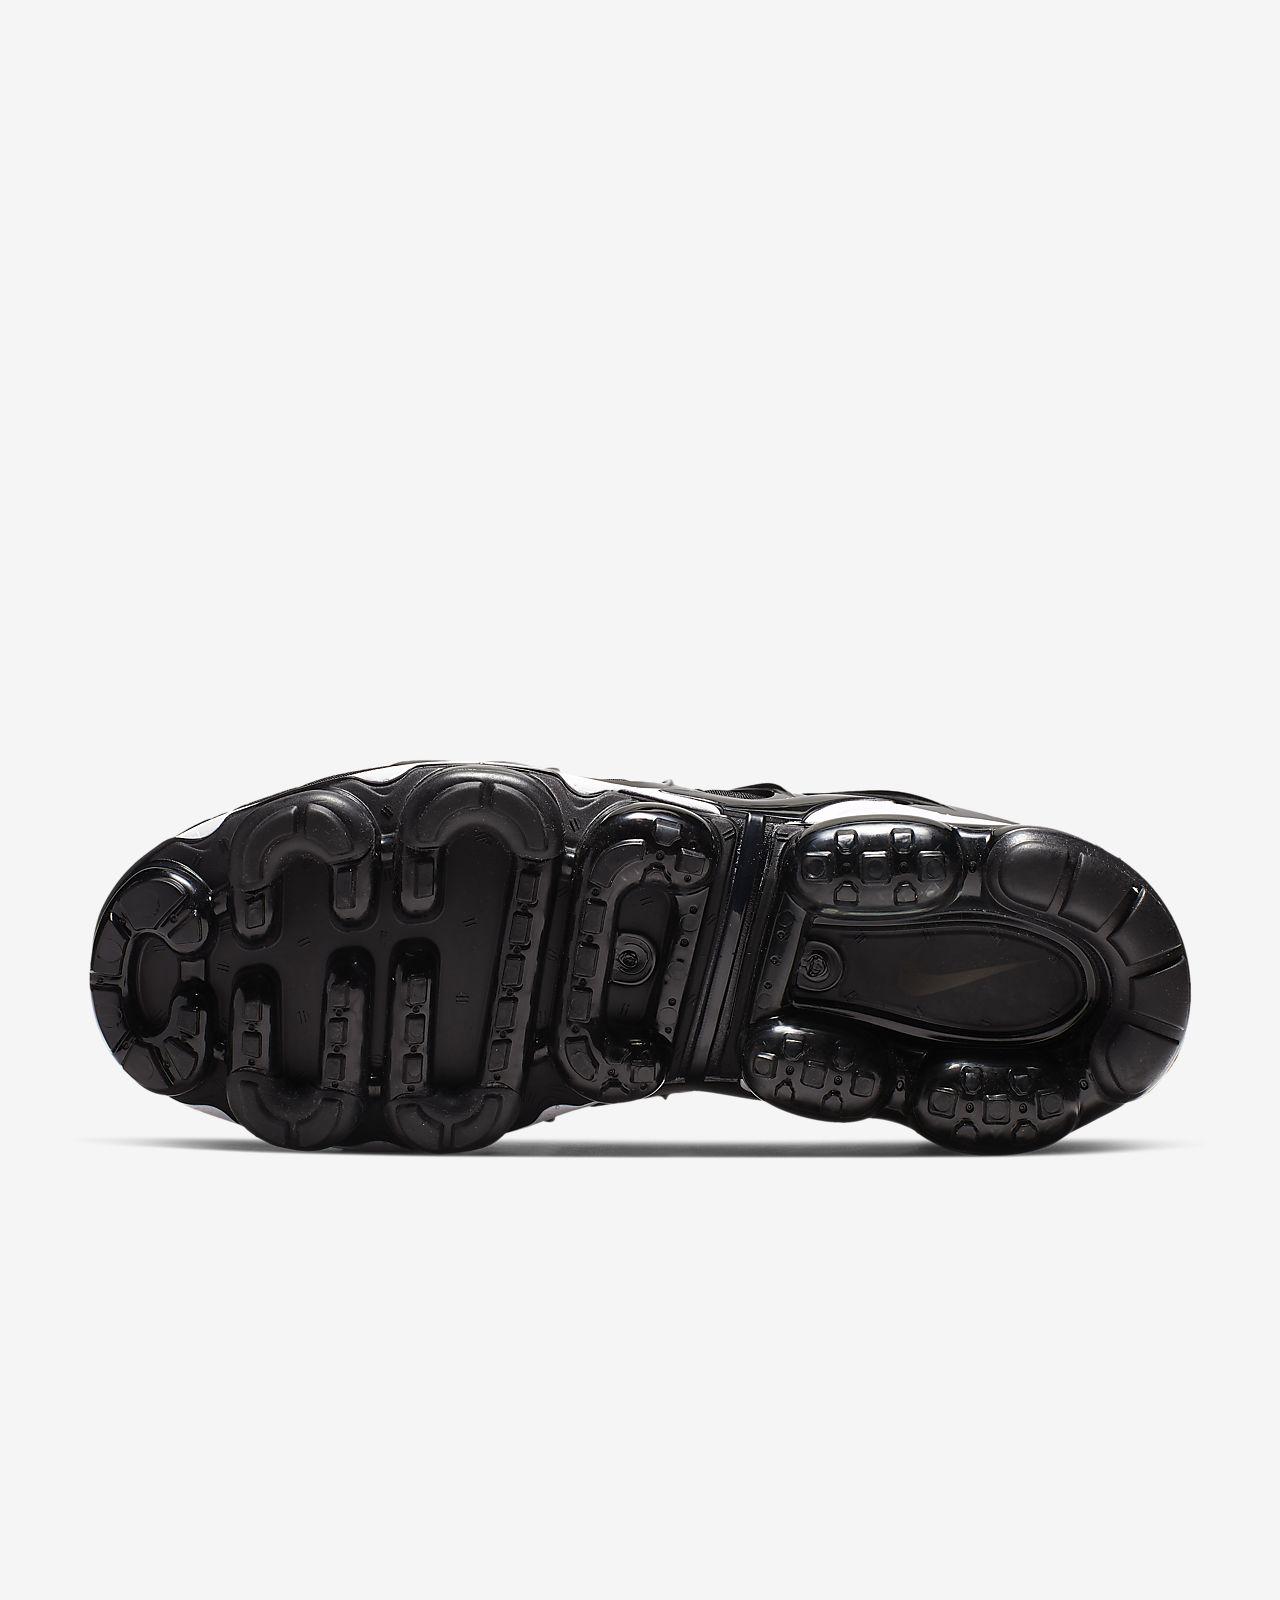 finest selection dbe98 62afe ... Calzado para hombre Nike Air VaporMax Plus